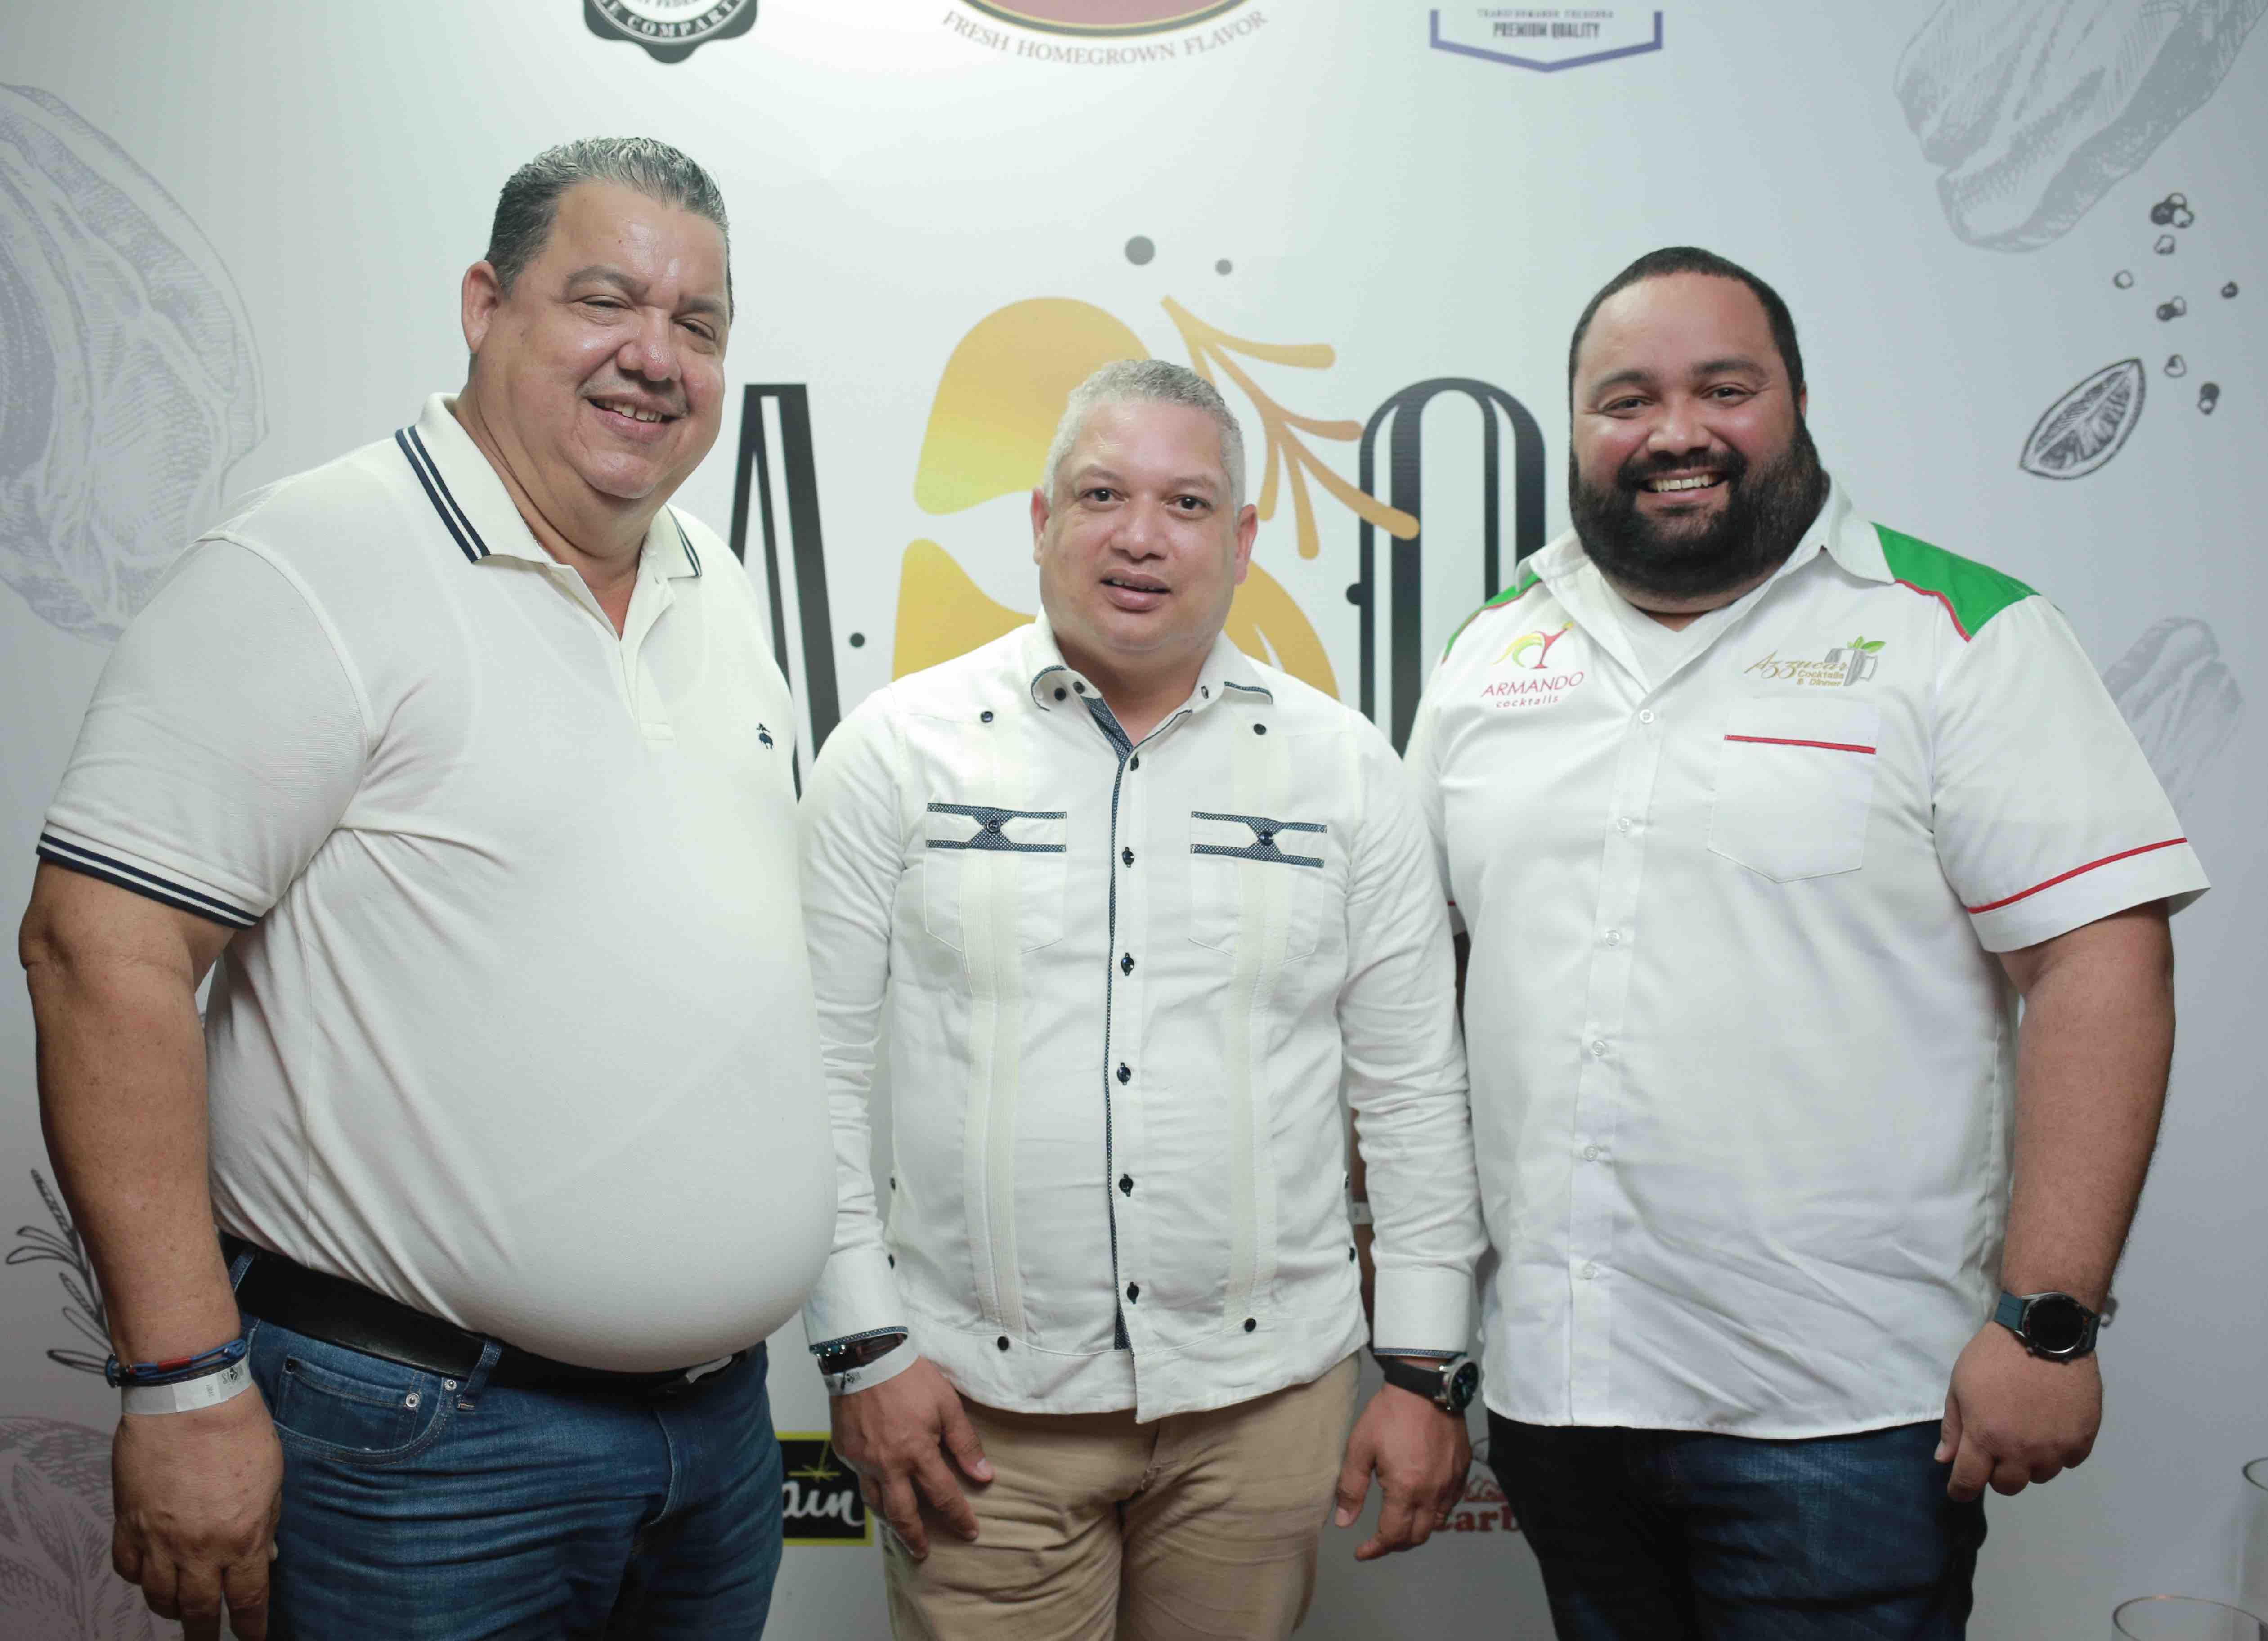 13. Arismendi de Moya, Daniel Canela & Armando Cabreja